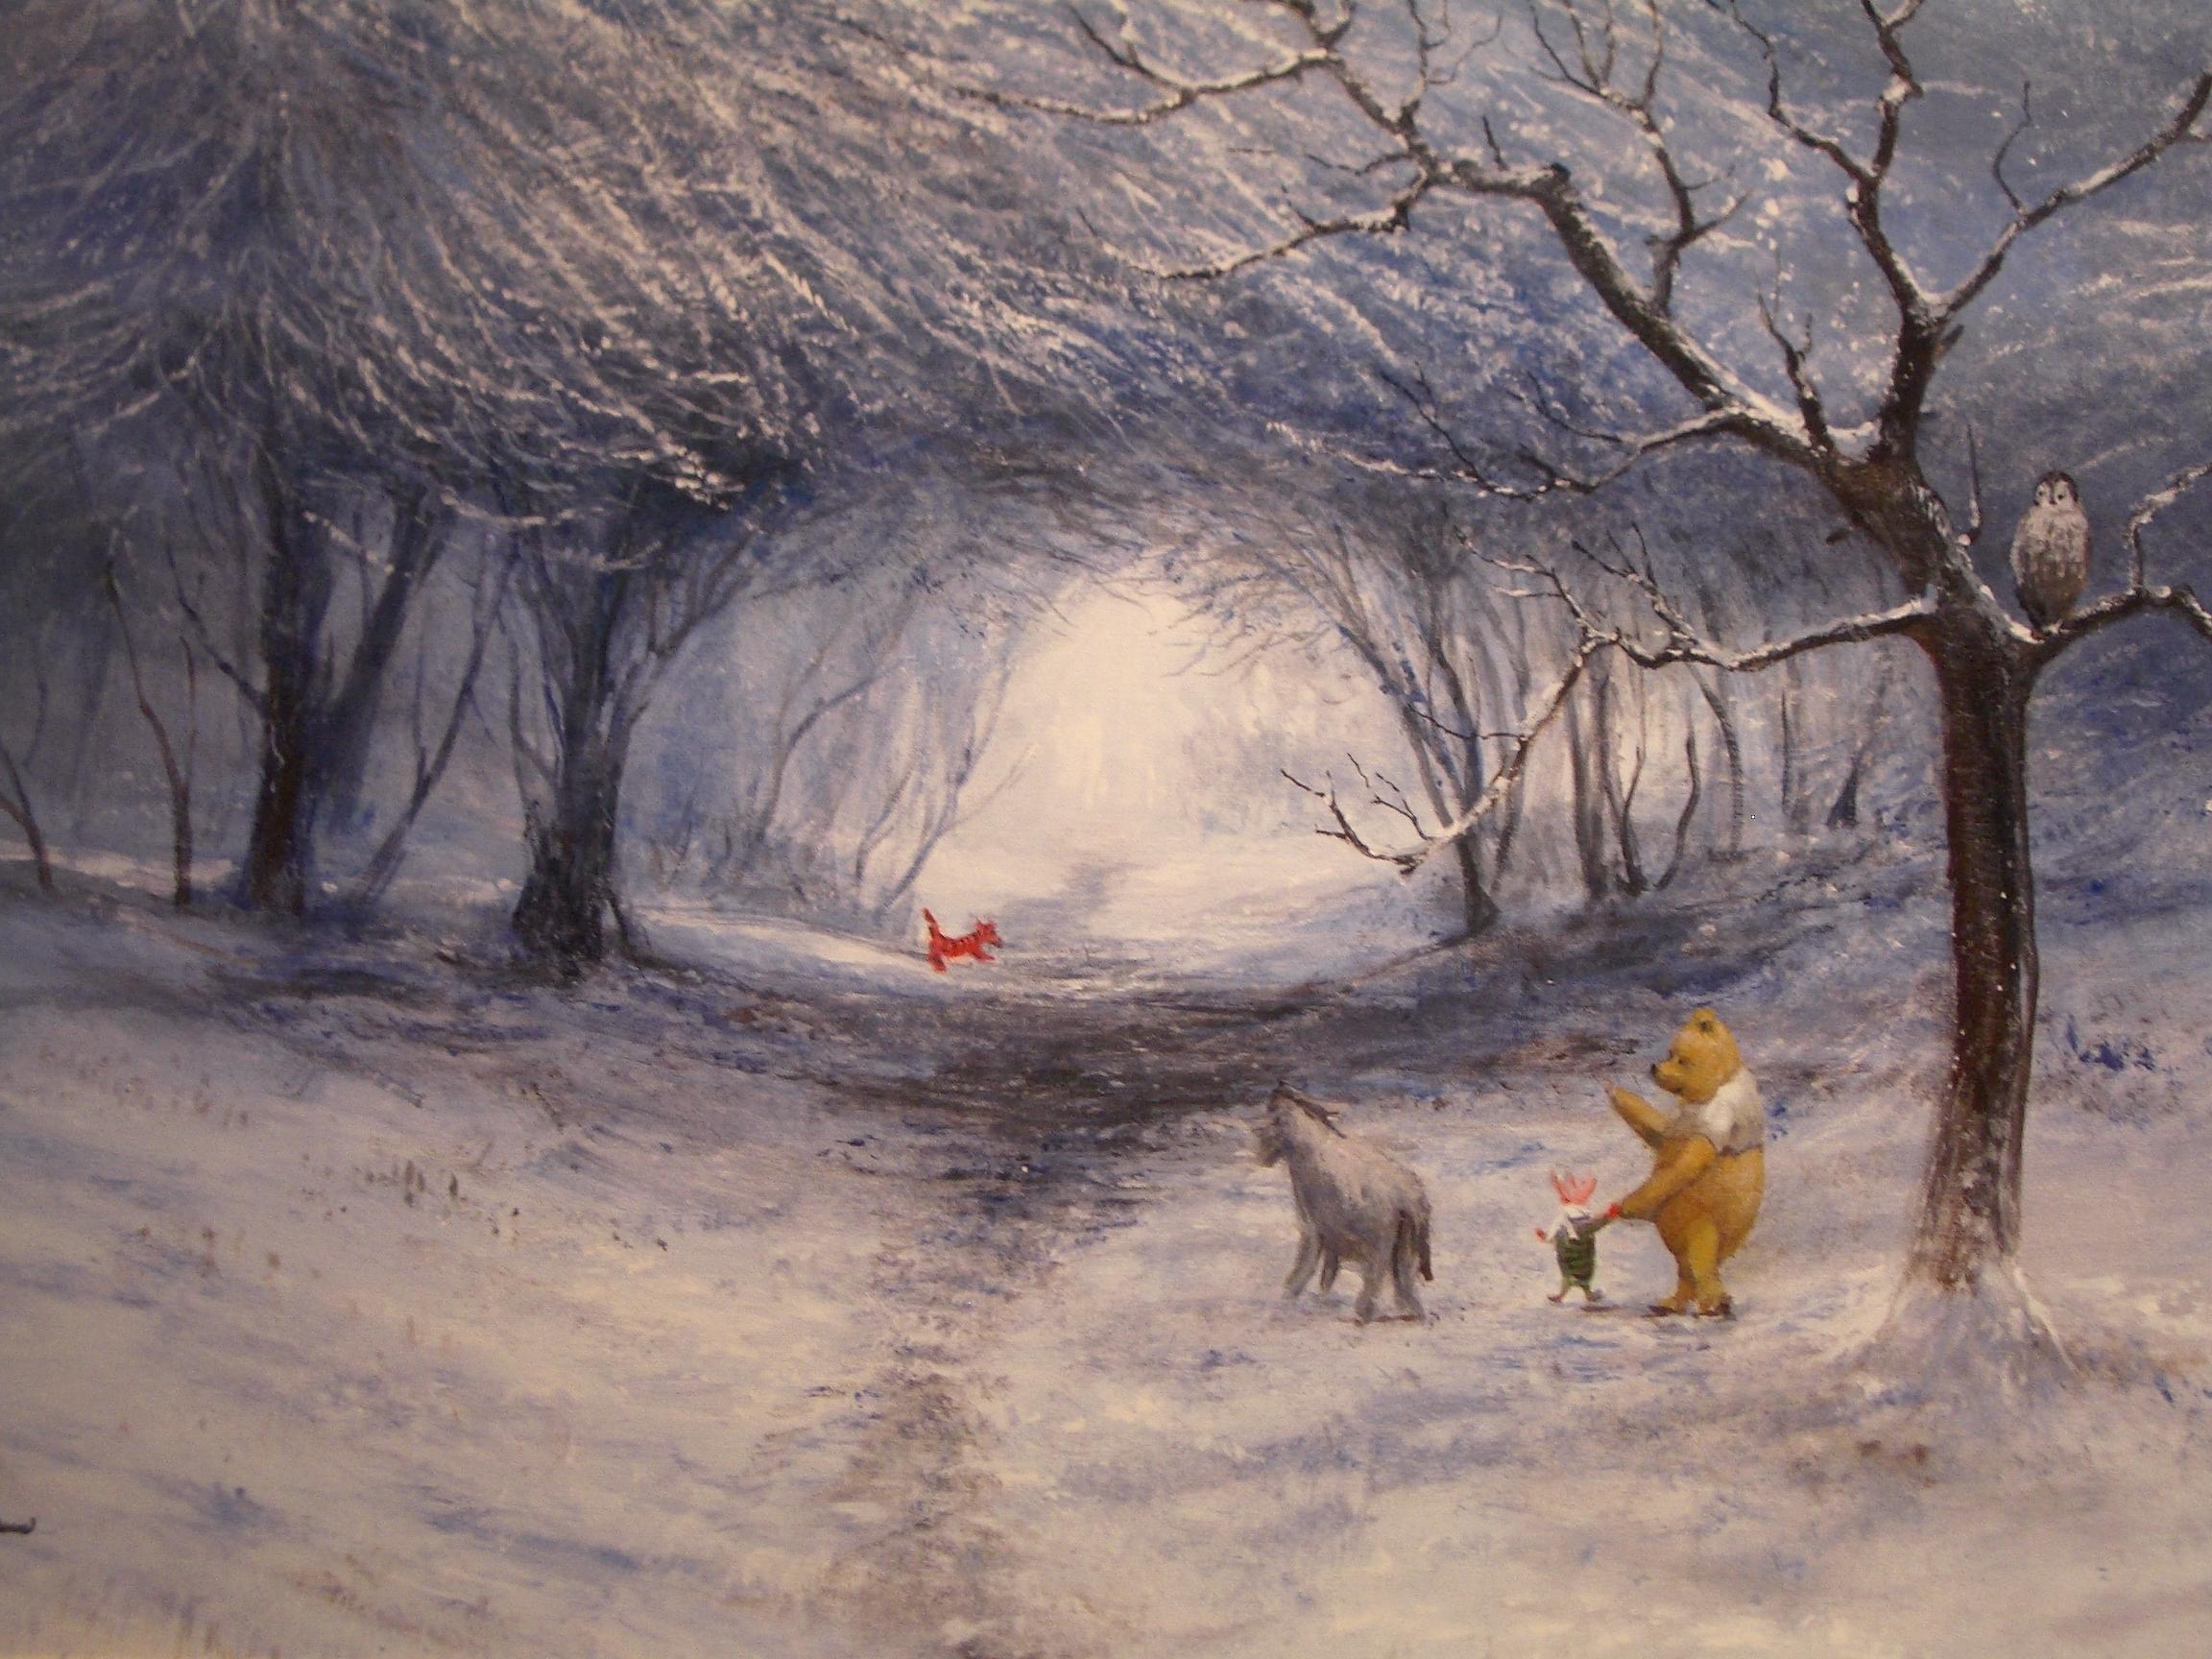 Free Download Original Winnie The Pooh Wallpaper Original